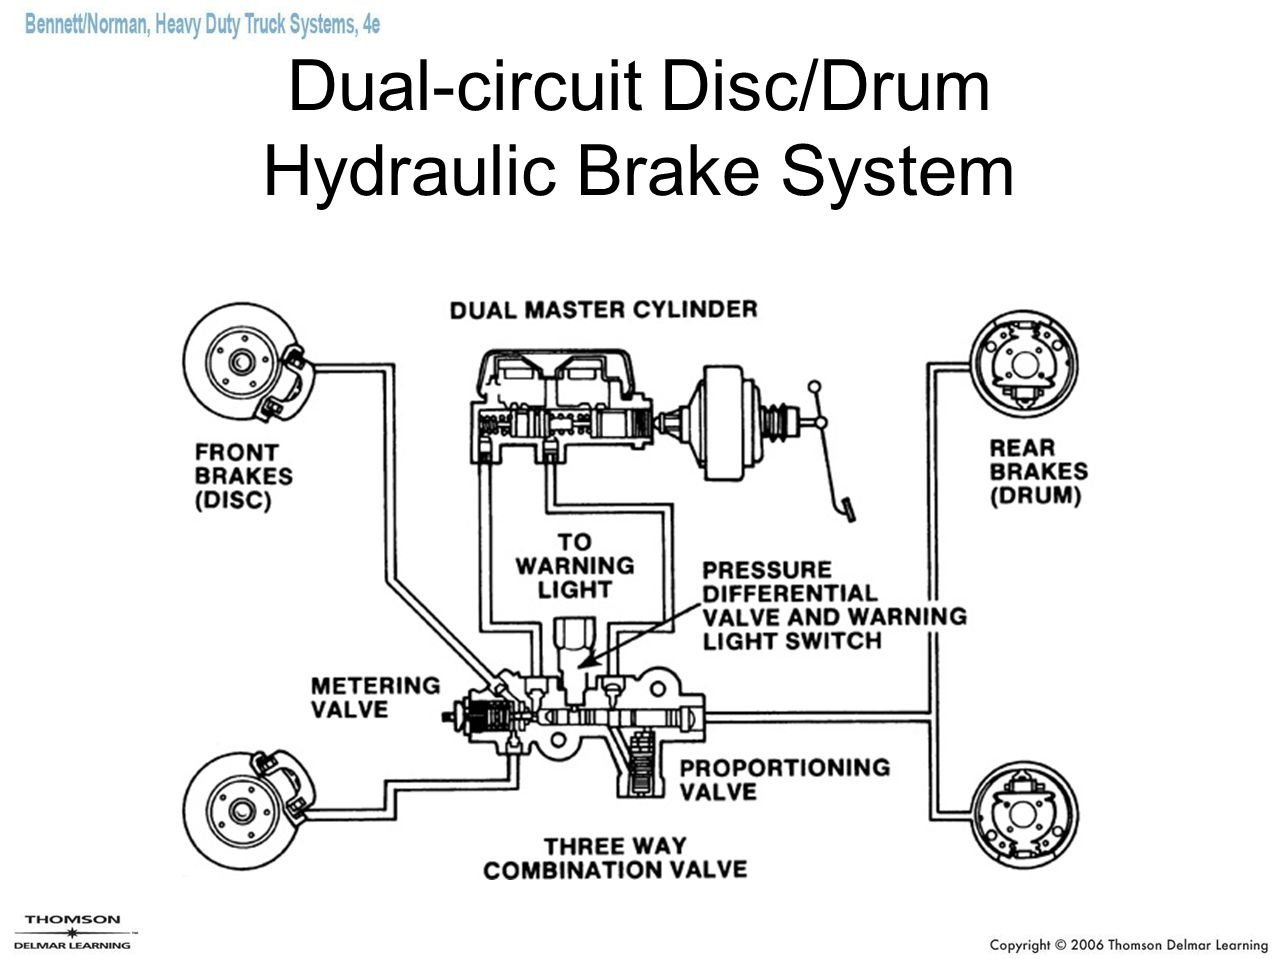 dual-circuit+discdrum+hydraulic+brake+system jpg